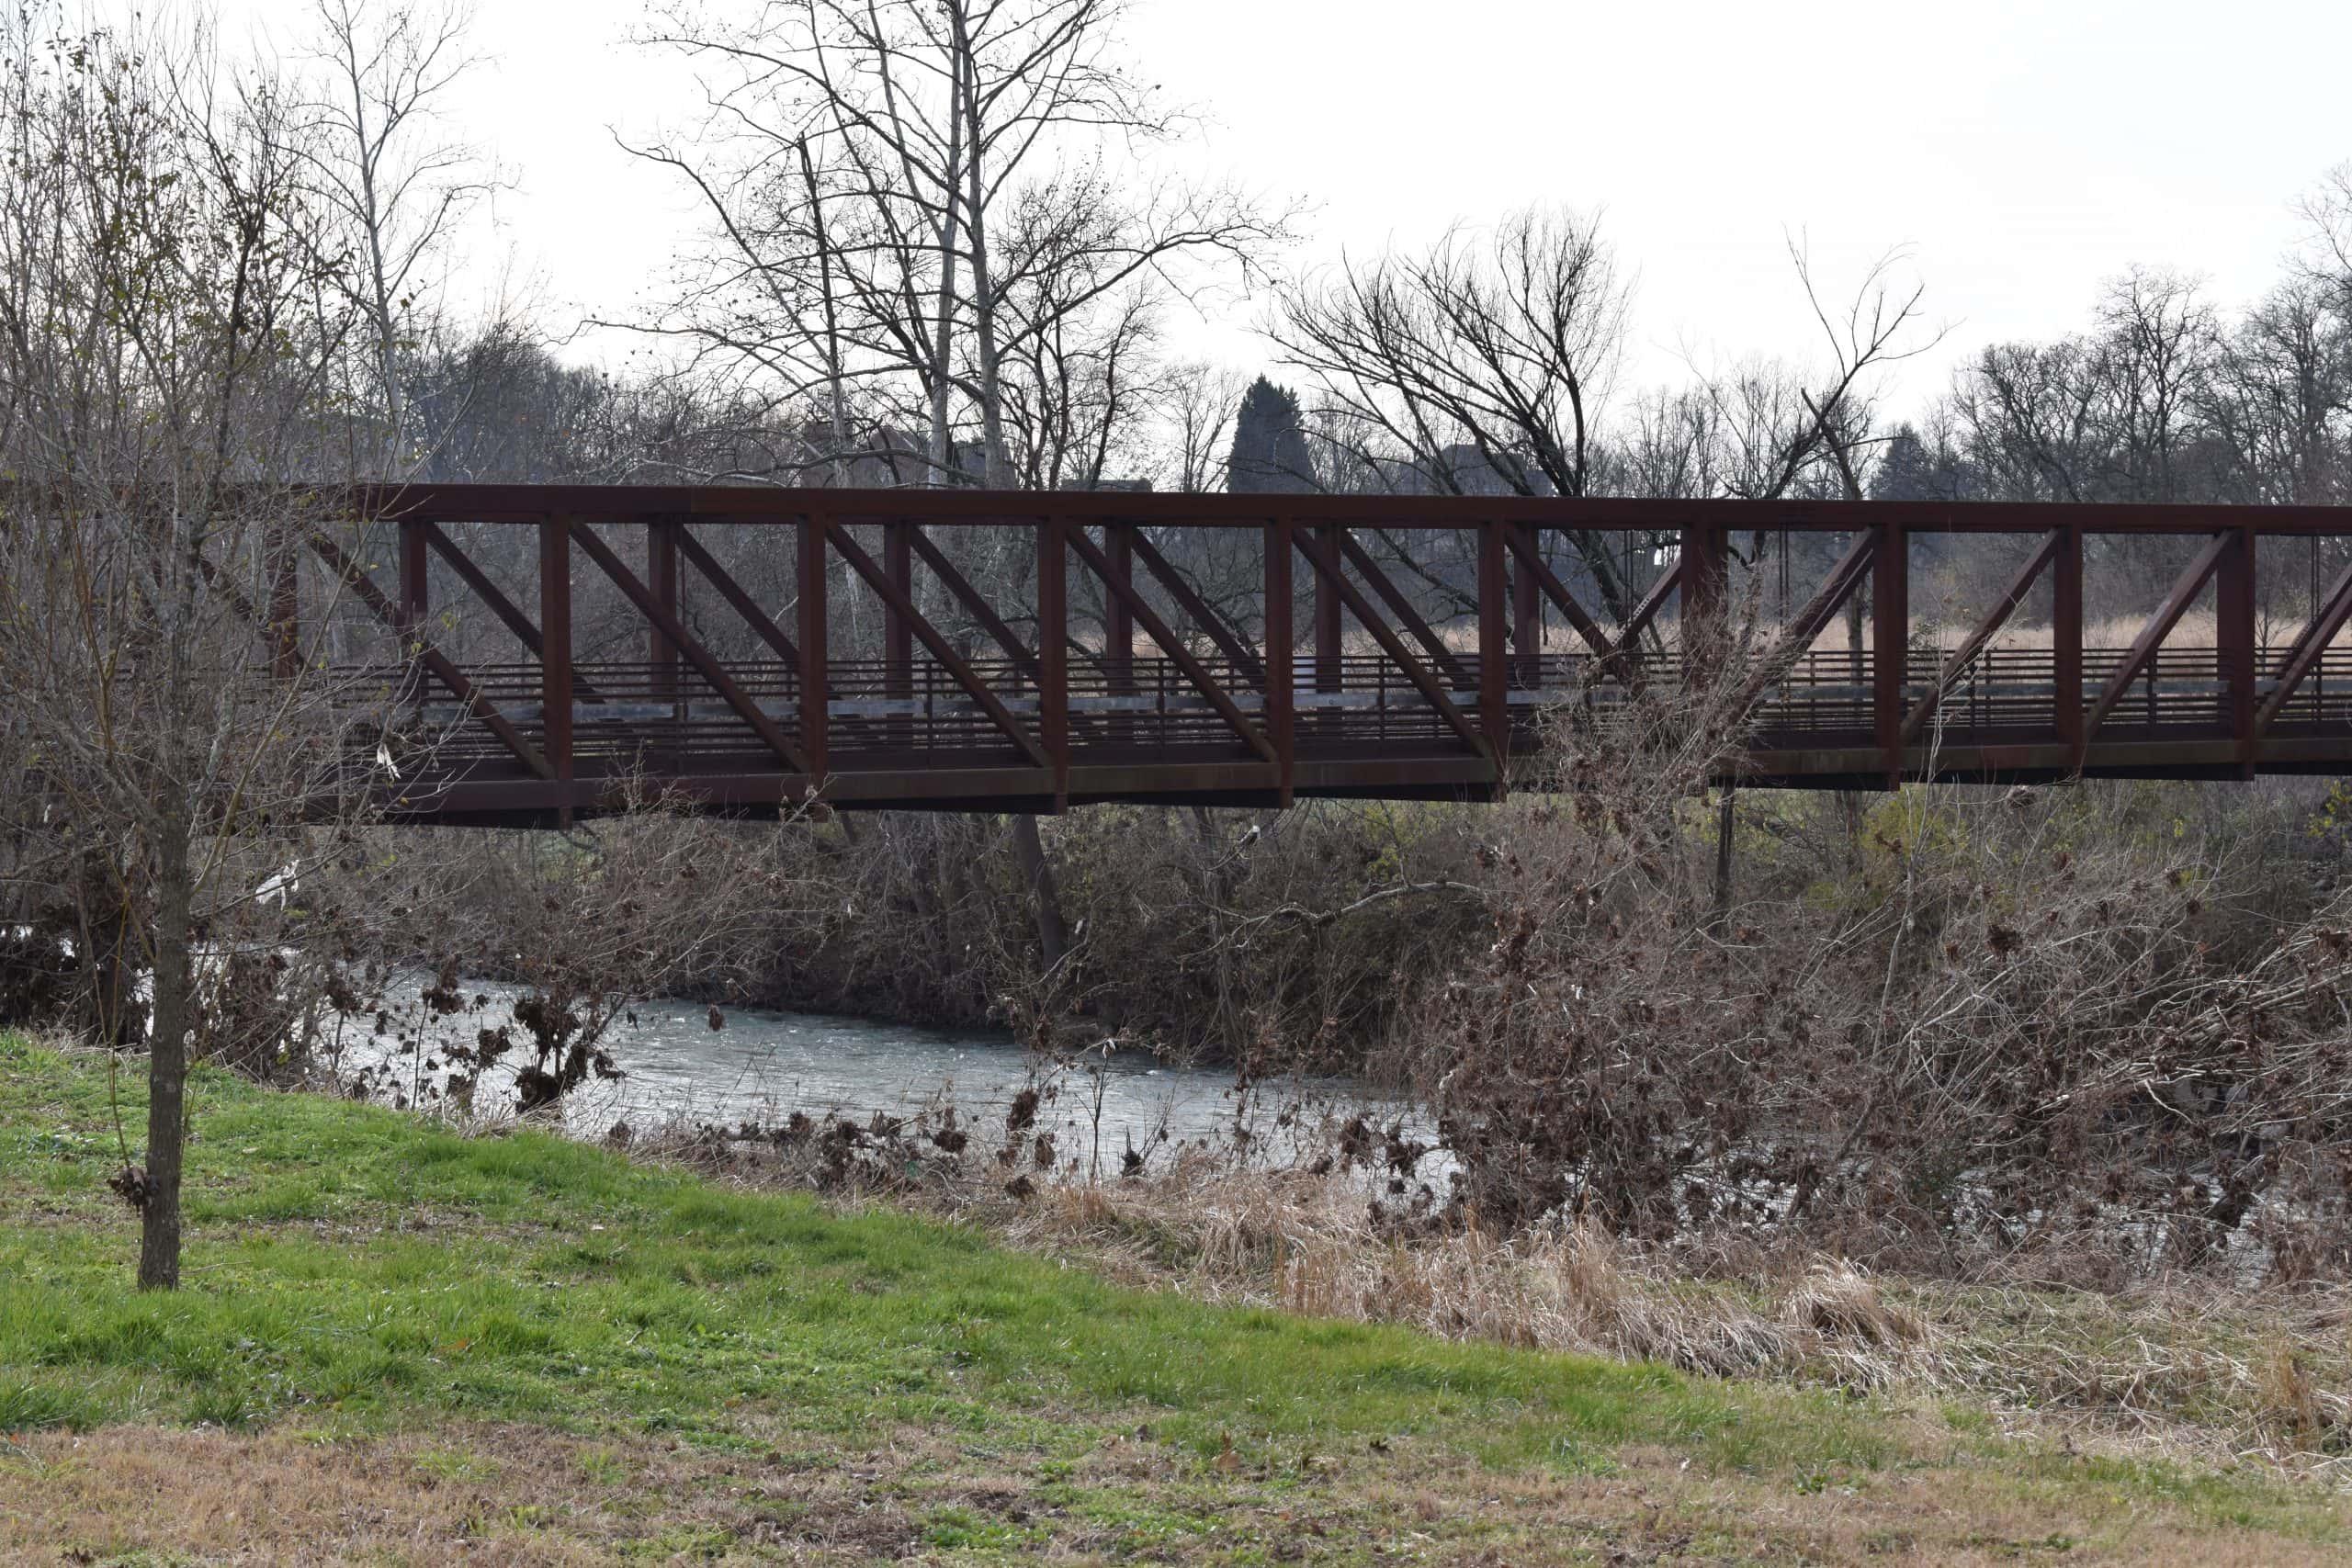 Roanoke Hikes Easy Roanoke Greenway Yoanoke Things to Do